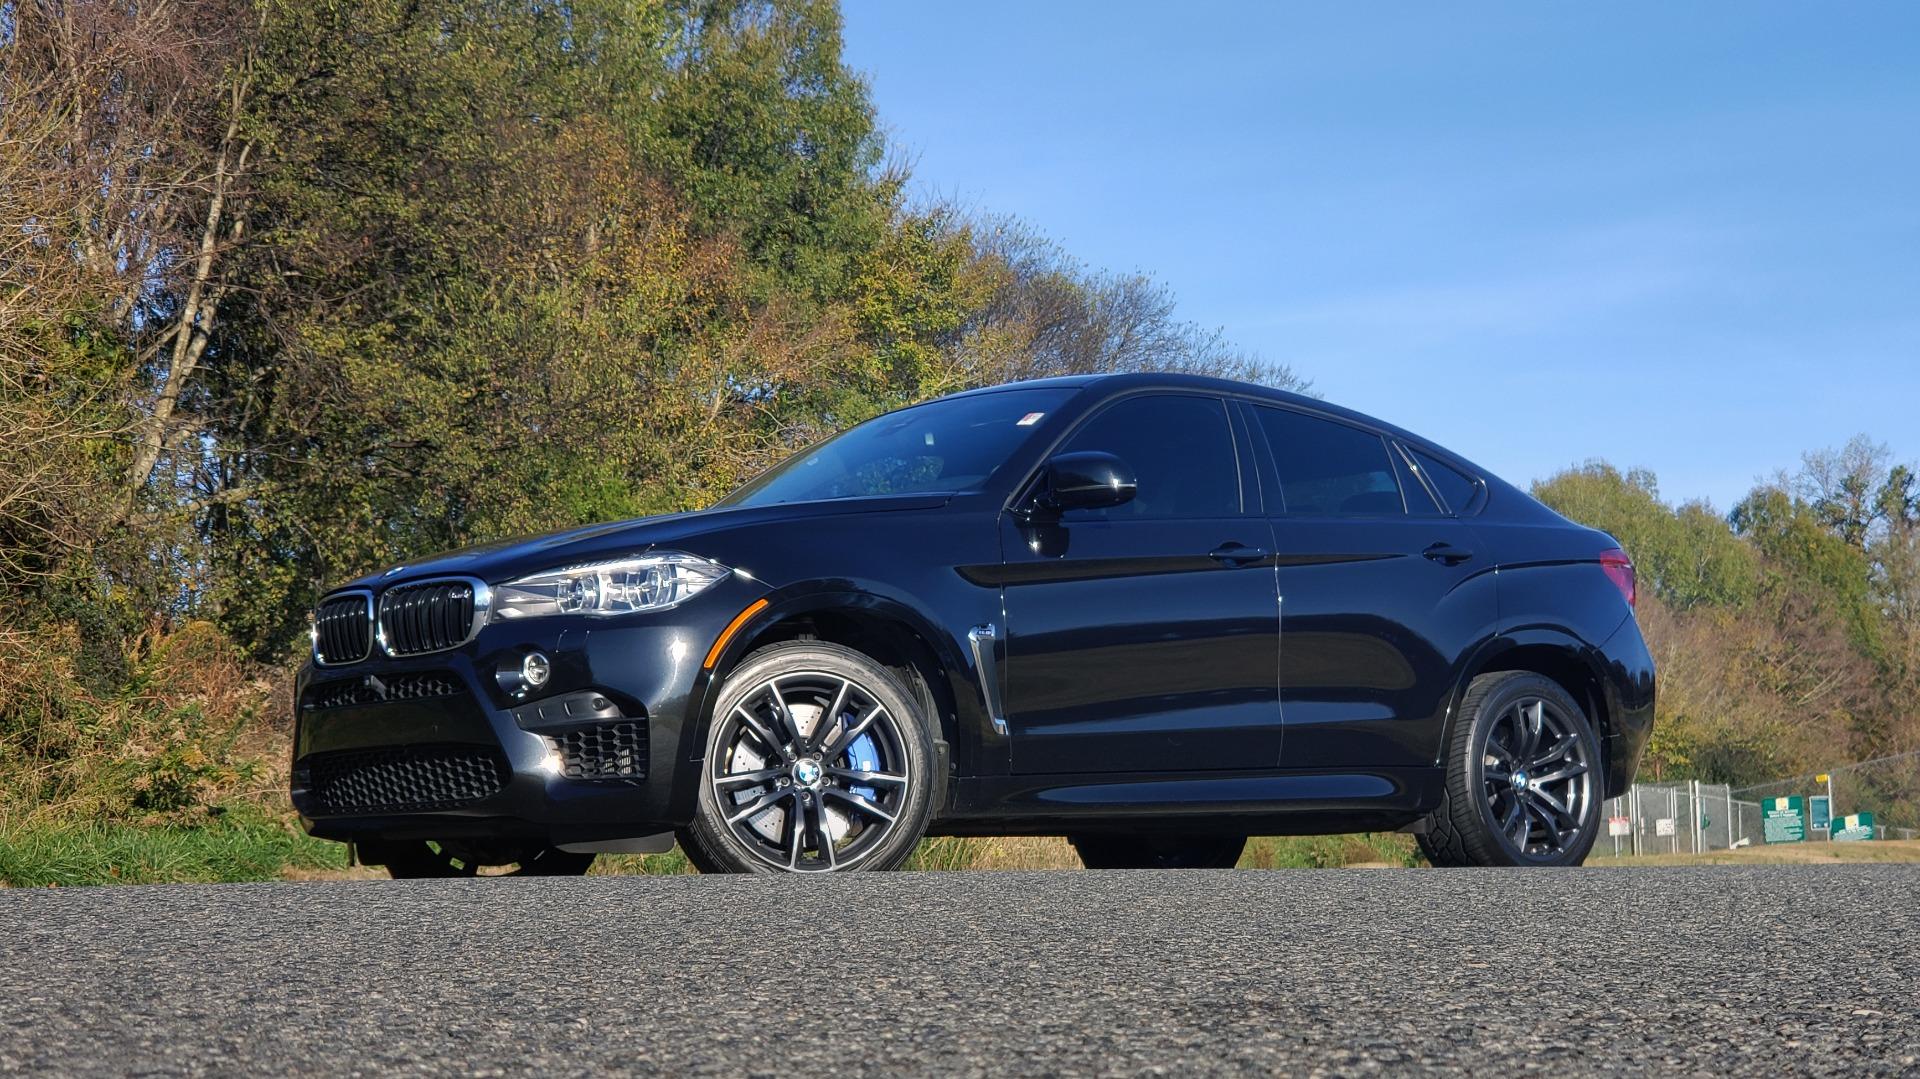 Used 2016 BMW X6 M EXEC PKG / DRVR ASST / NAV / SUNROOF / BLIND SPOT / REARVIEW for sale Sold at Formula Imports in Charlotte NC 28227 85